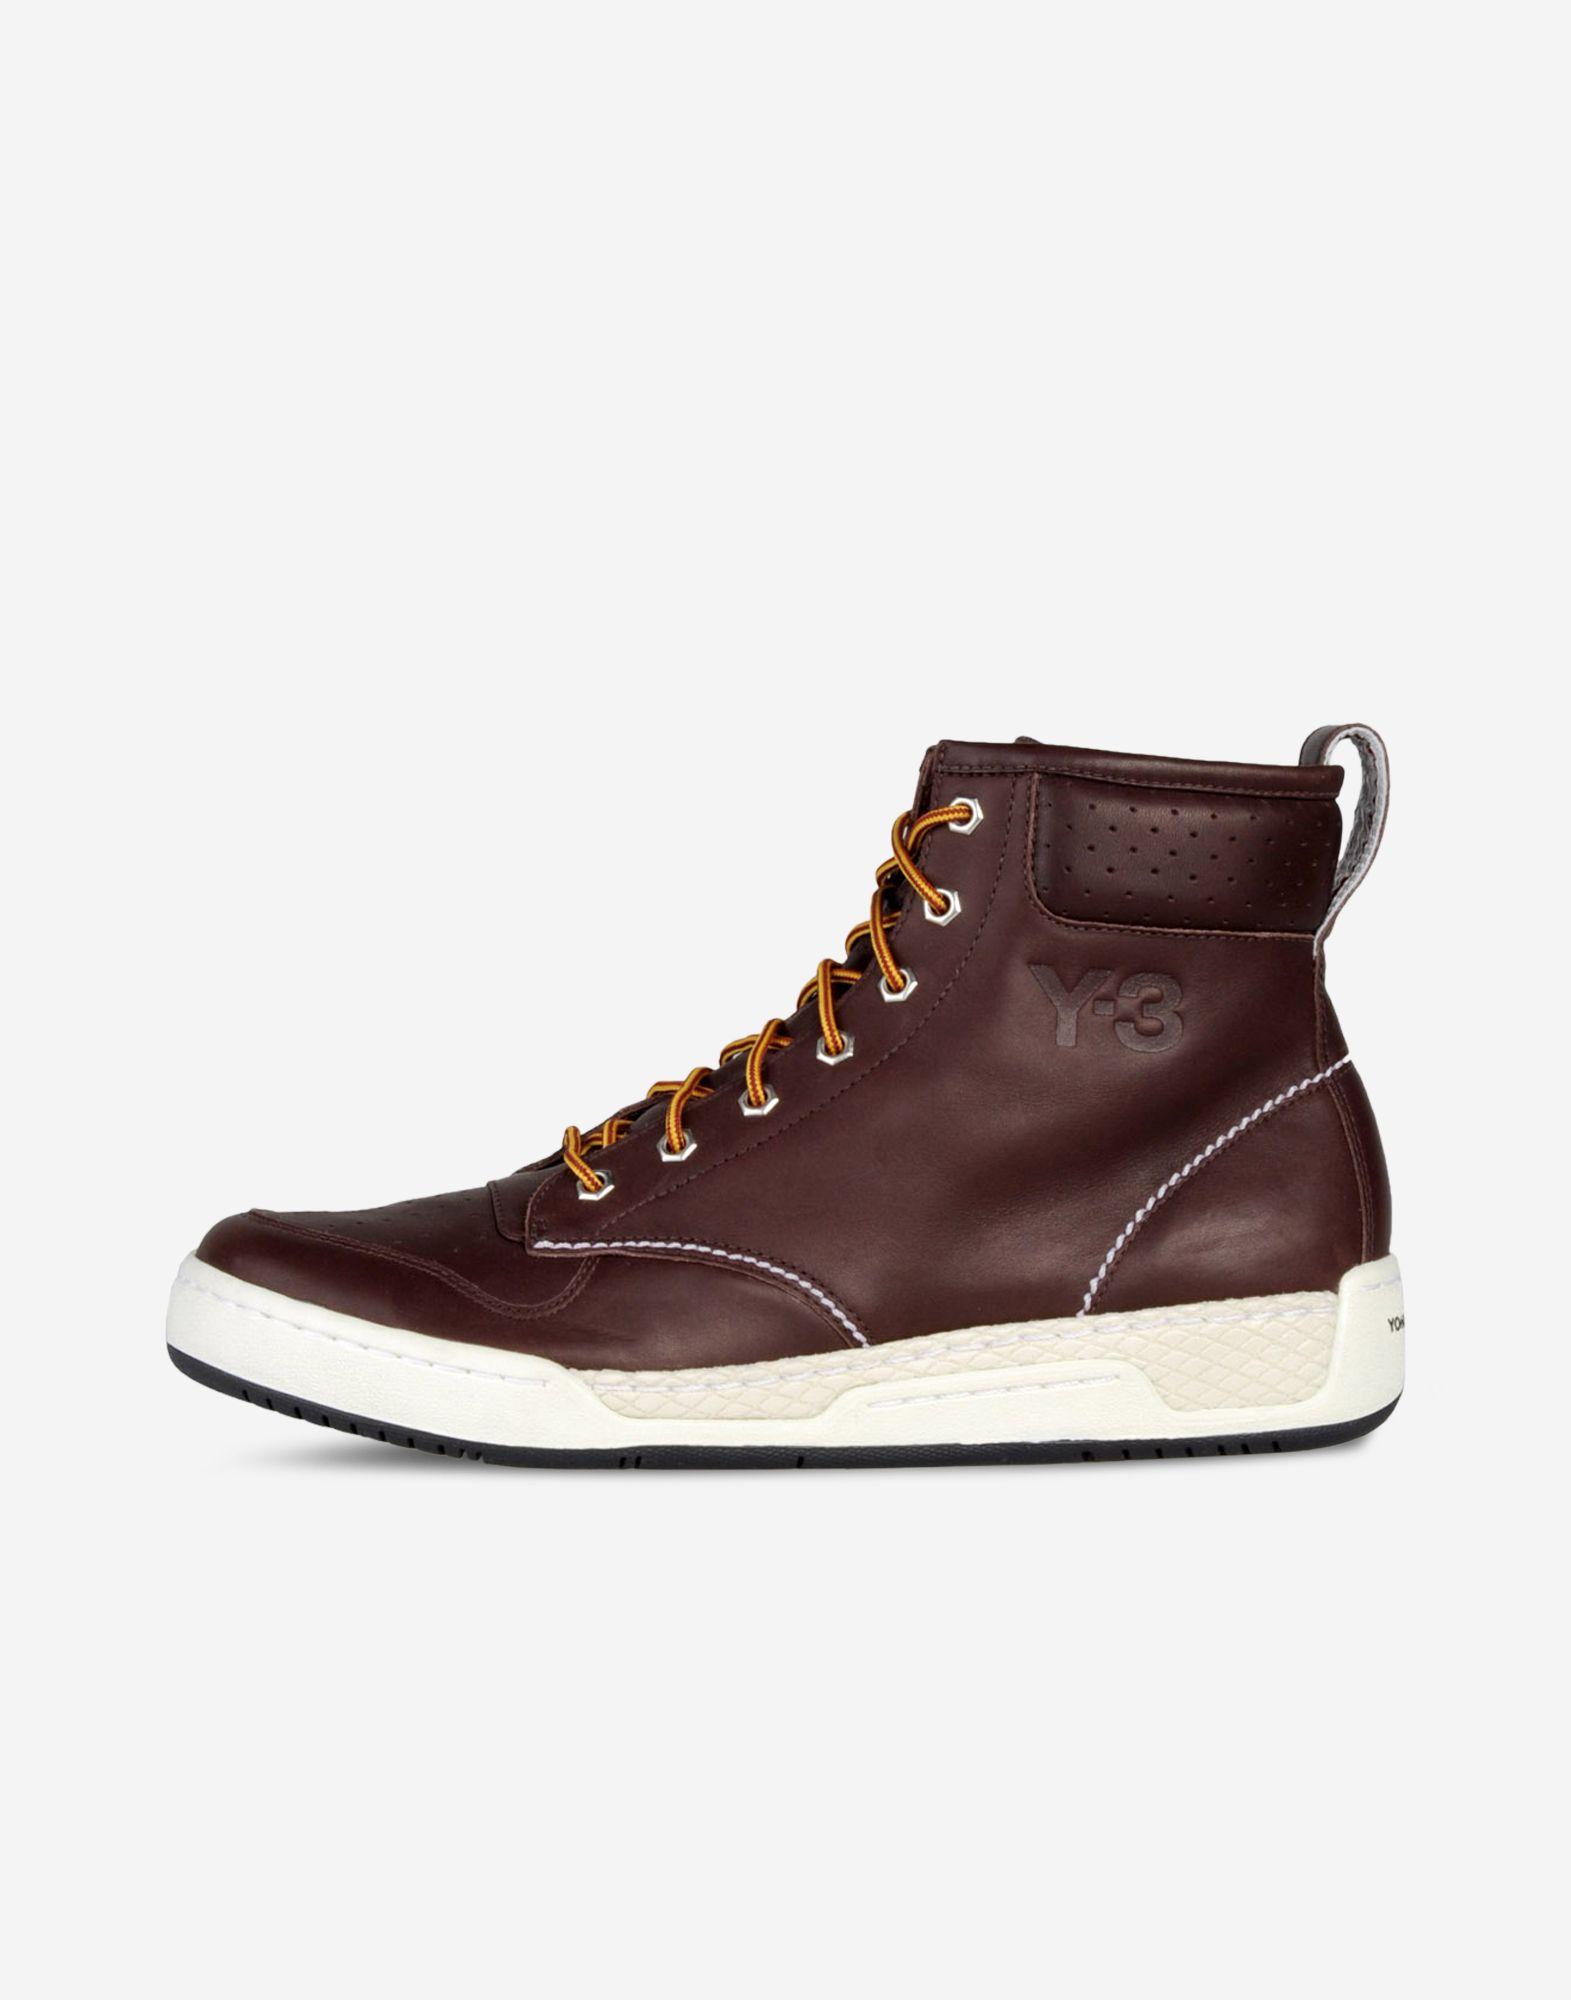 Y 3 Hayworth Classic High Top Sneakers | Adidas Y 3 Official